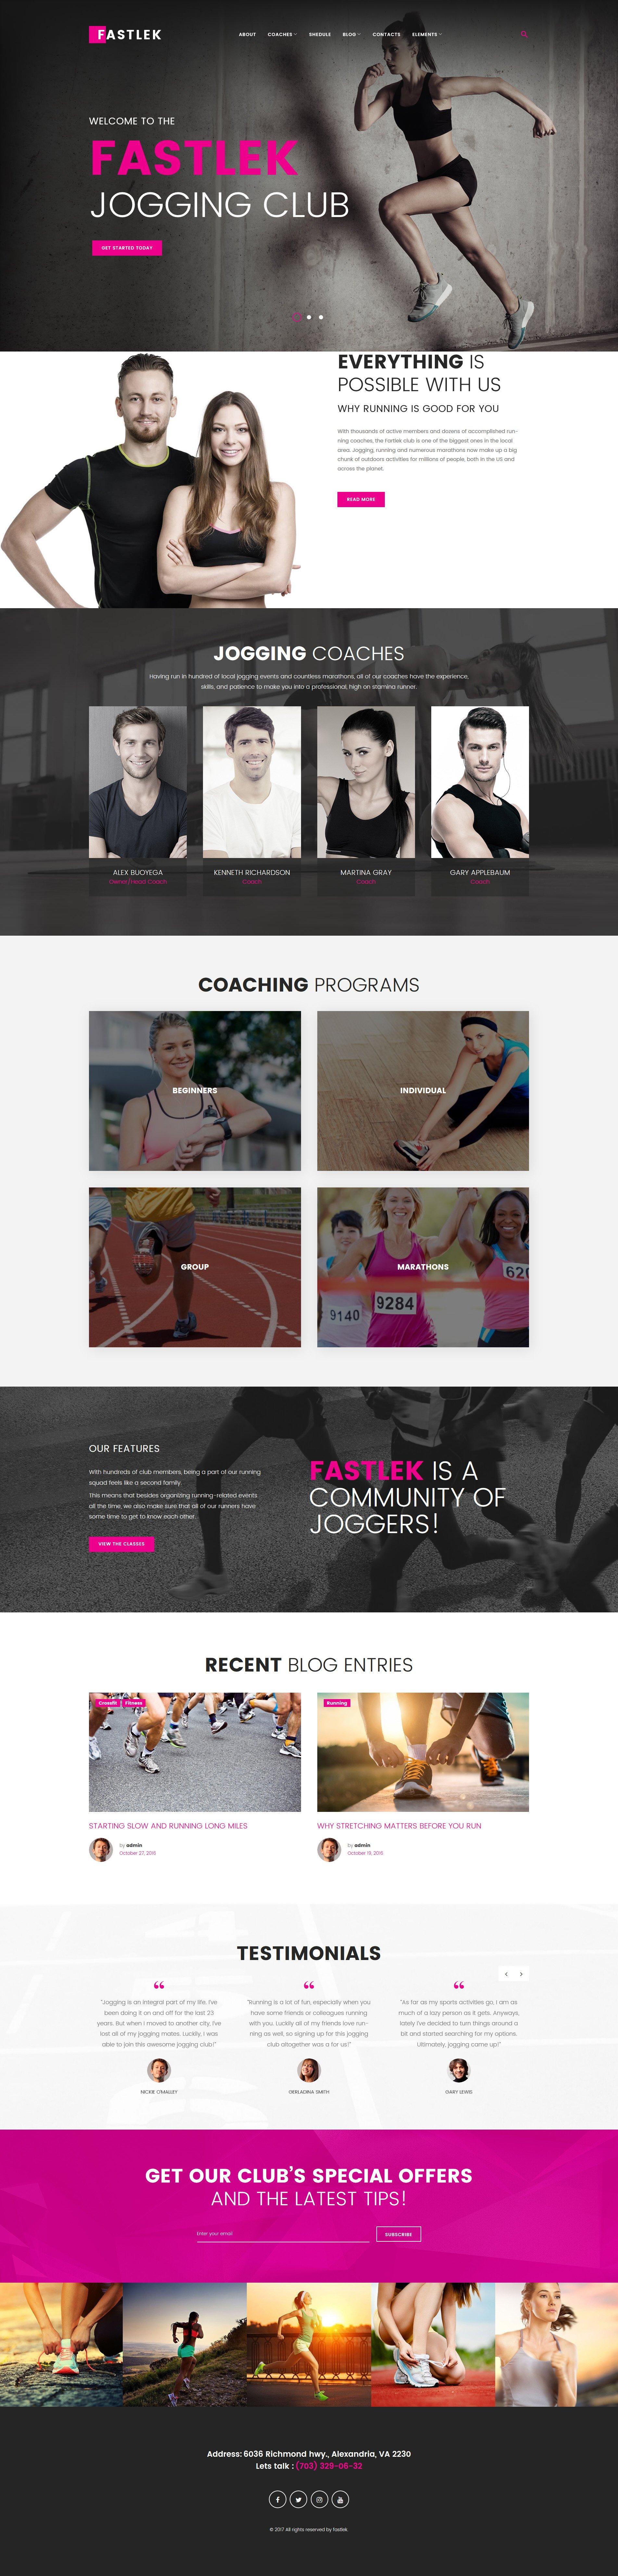 """Fastlek - Running Club & Coaching"" 响应式WordPress模板 #63582 - 截图"